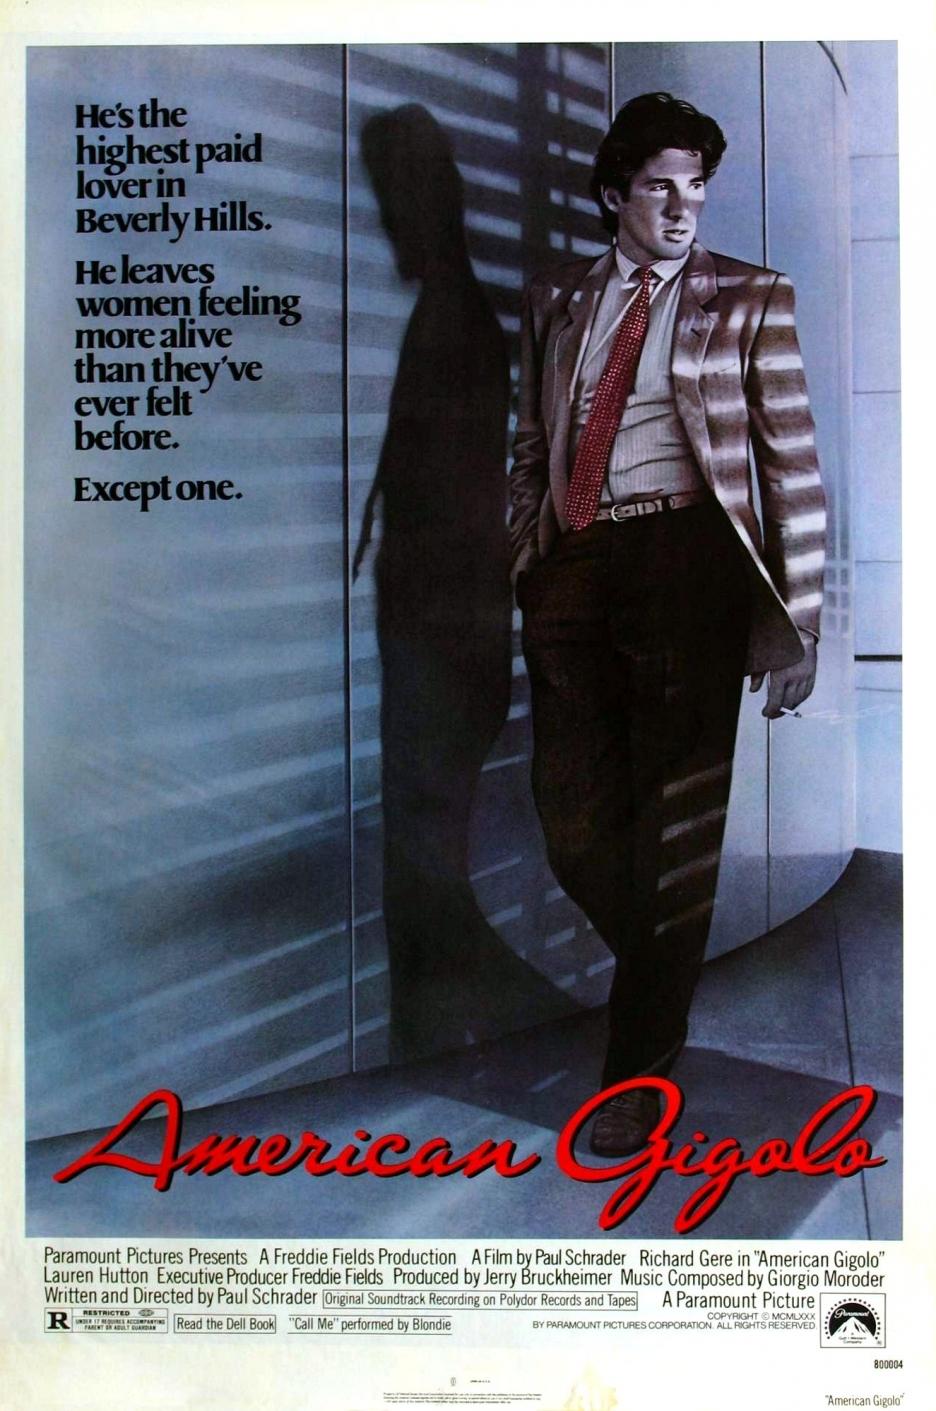 American-Gigolo-Richard-Gere-Movie-Poster.jpg